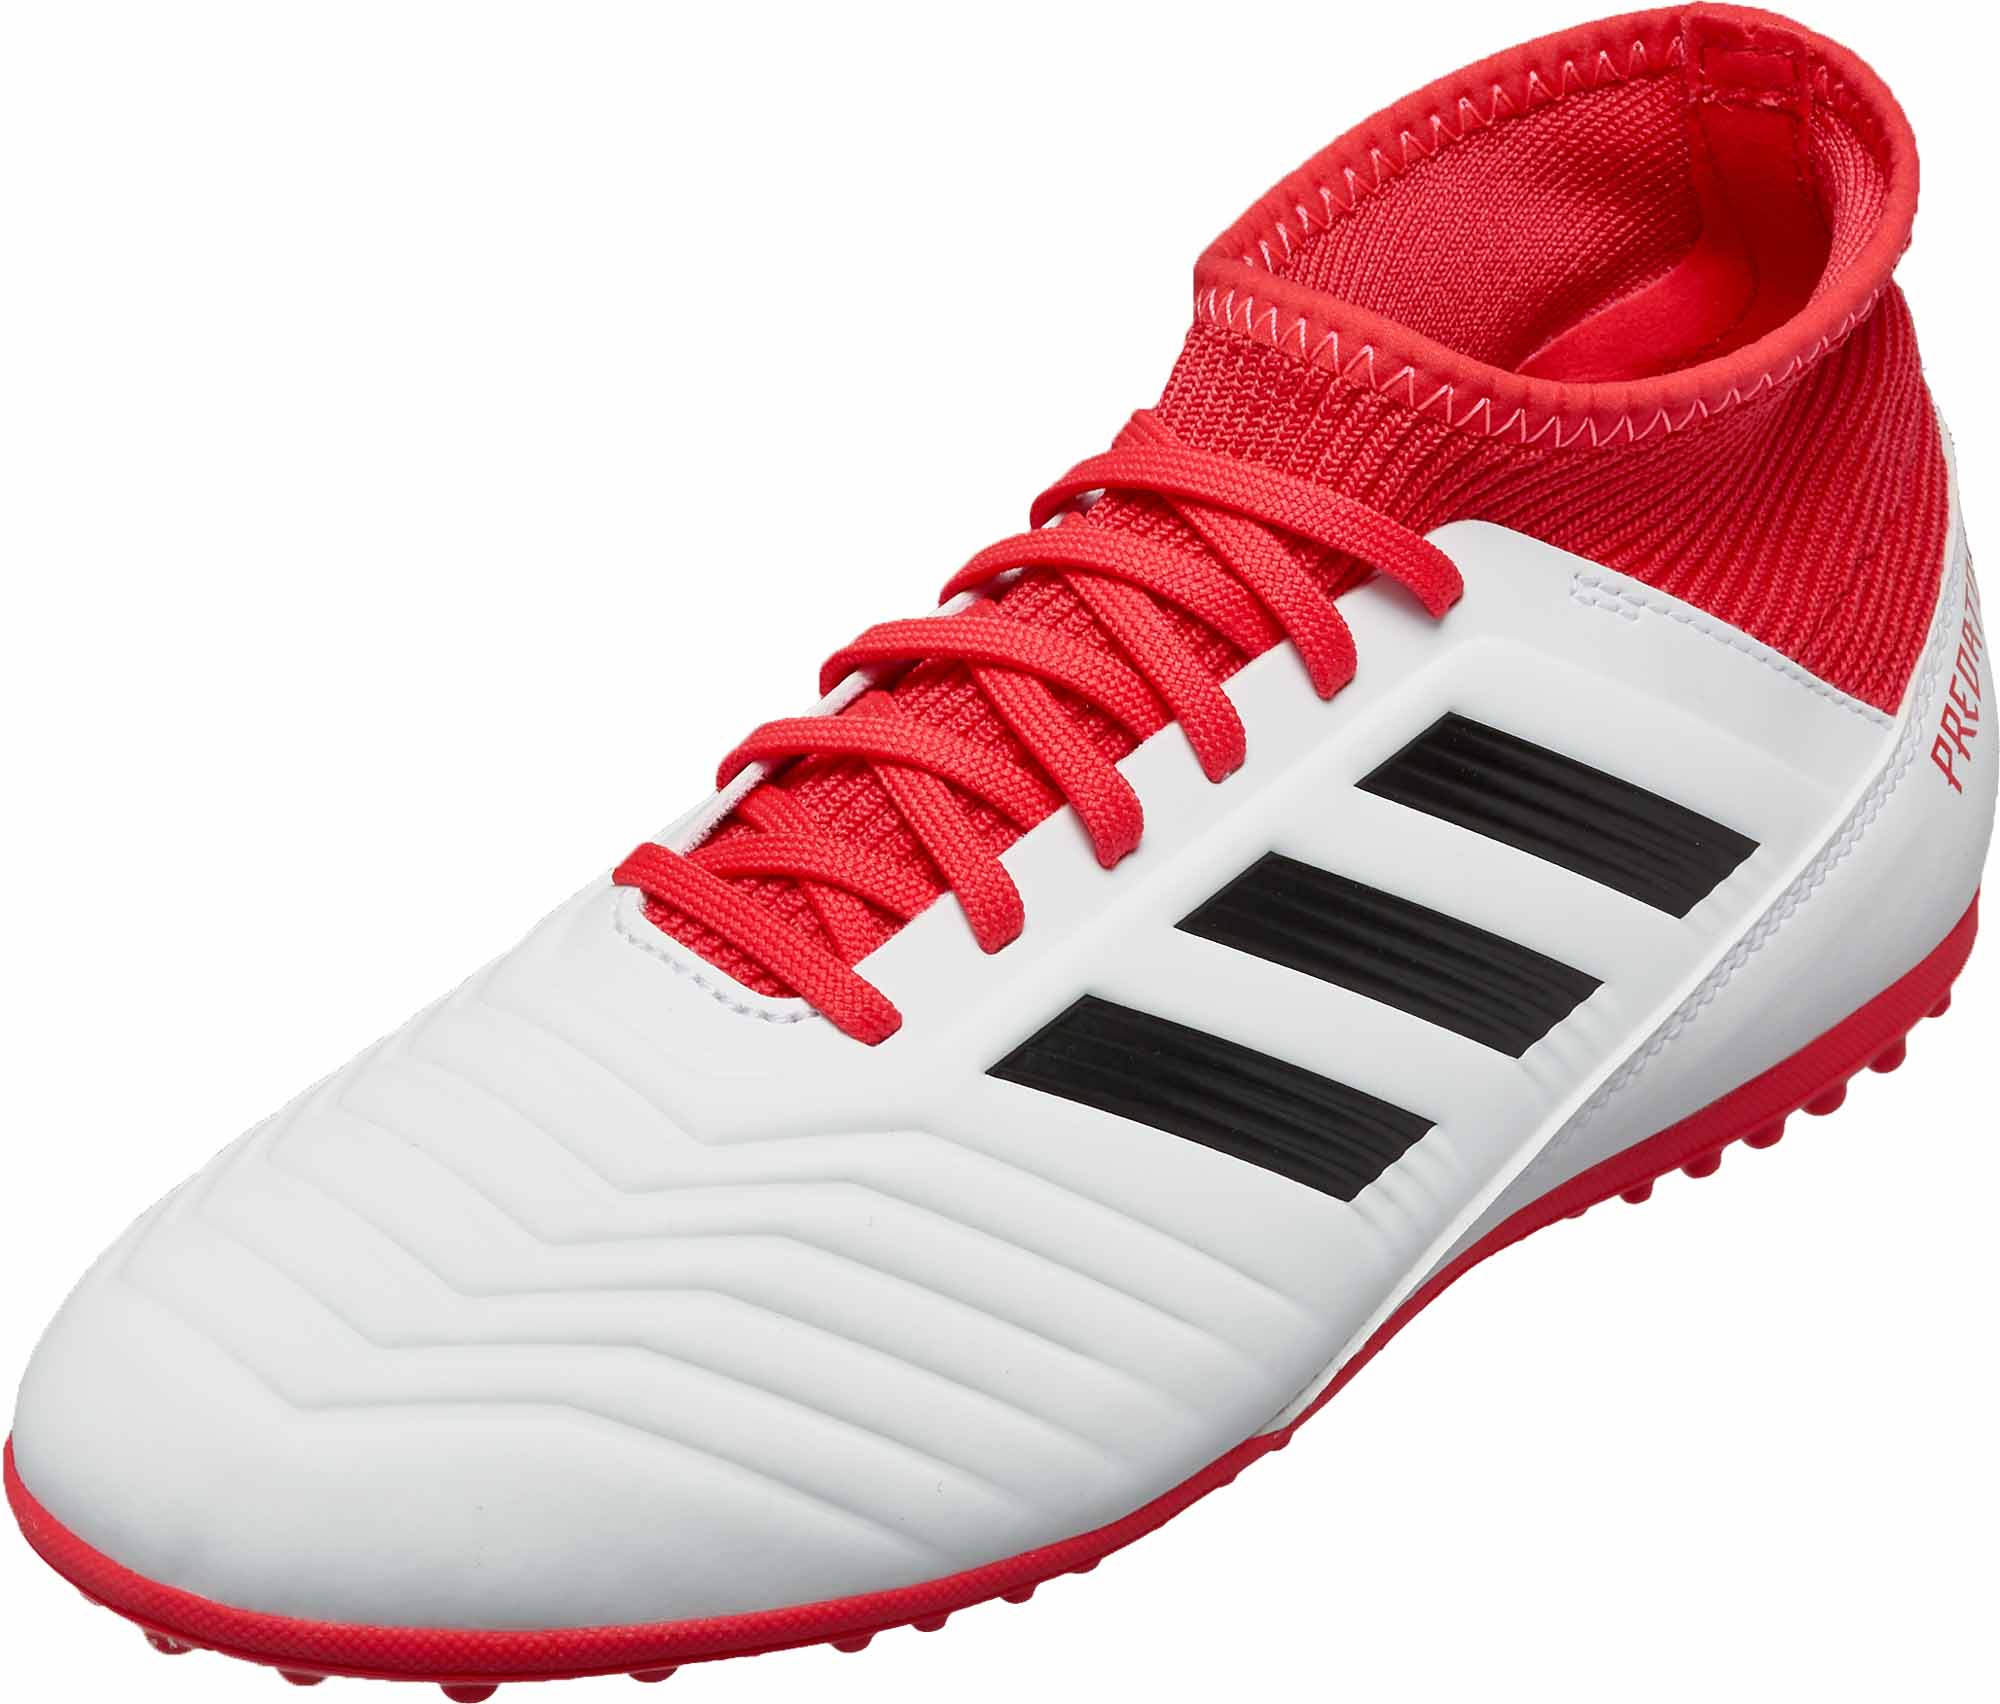 more photos 25fda 080a1 adidas Kids Predator Tango 18.3 TF – White Real Coral